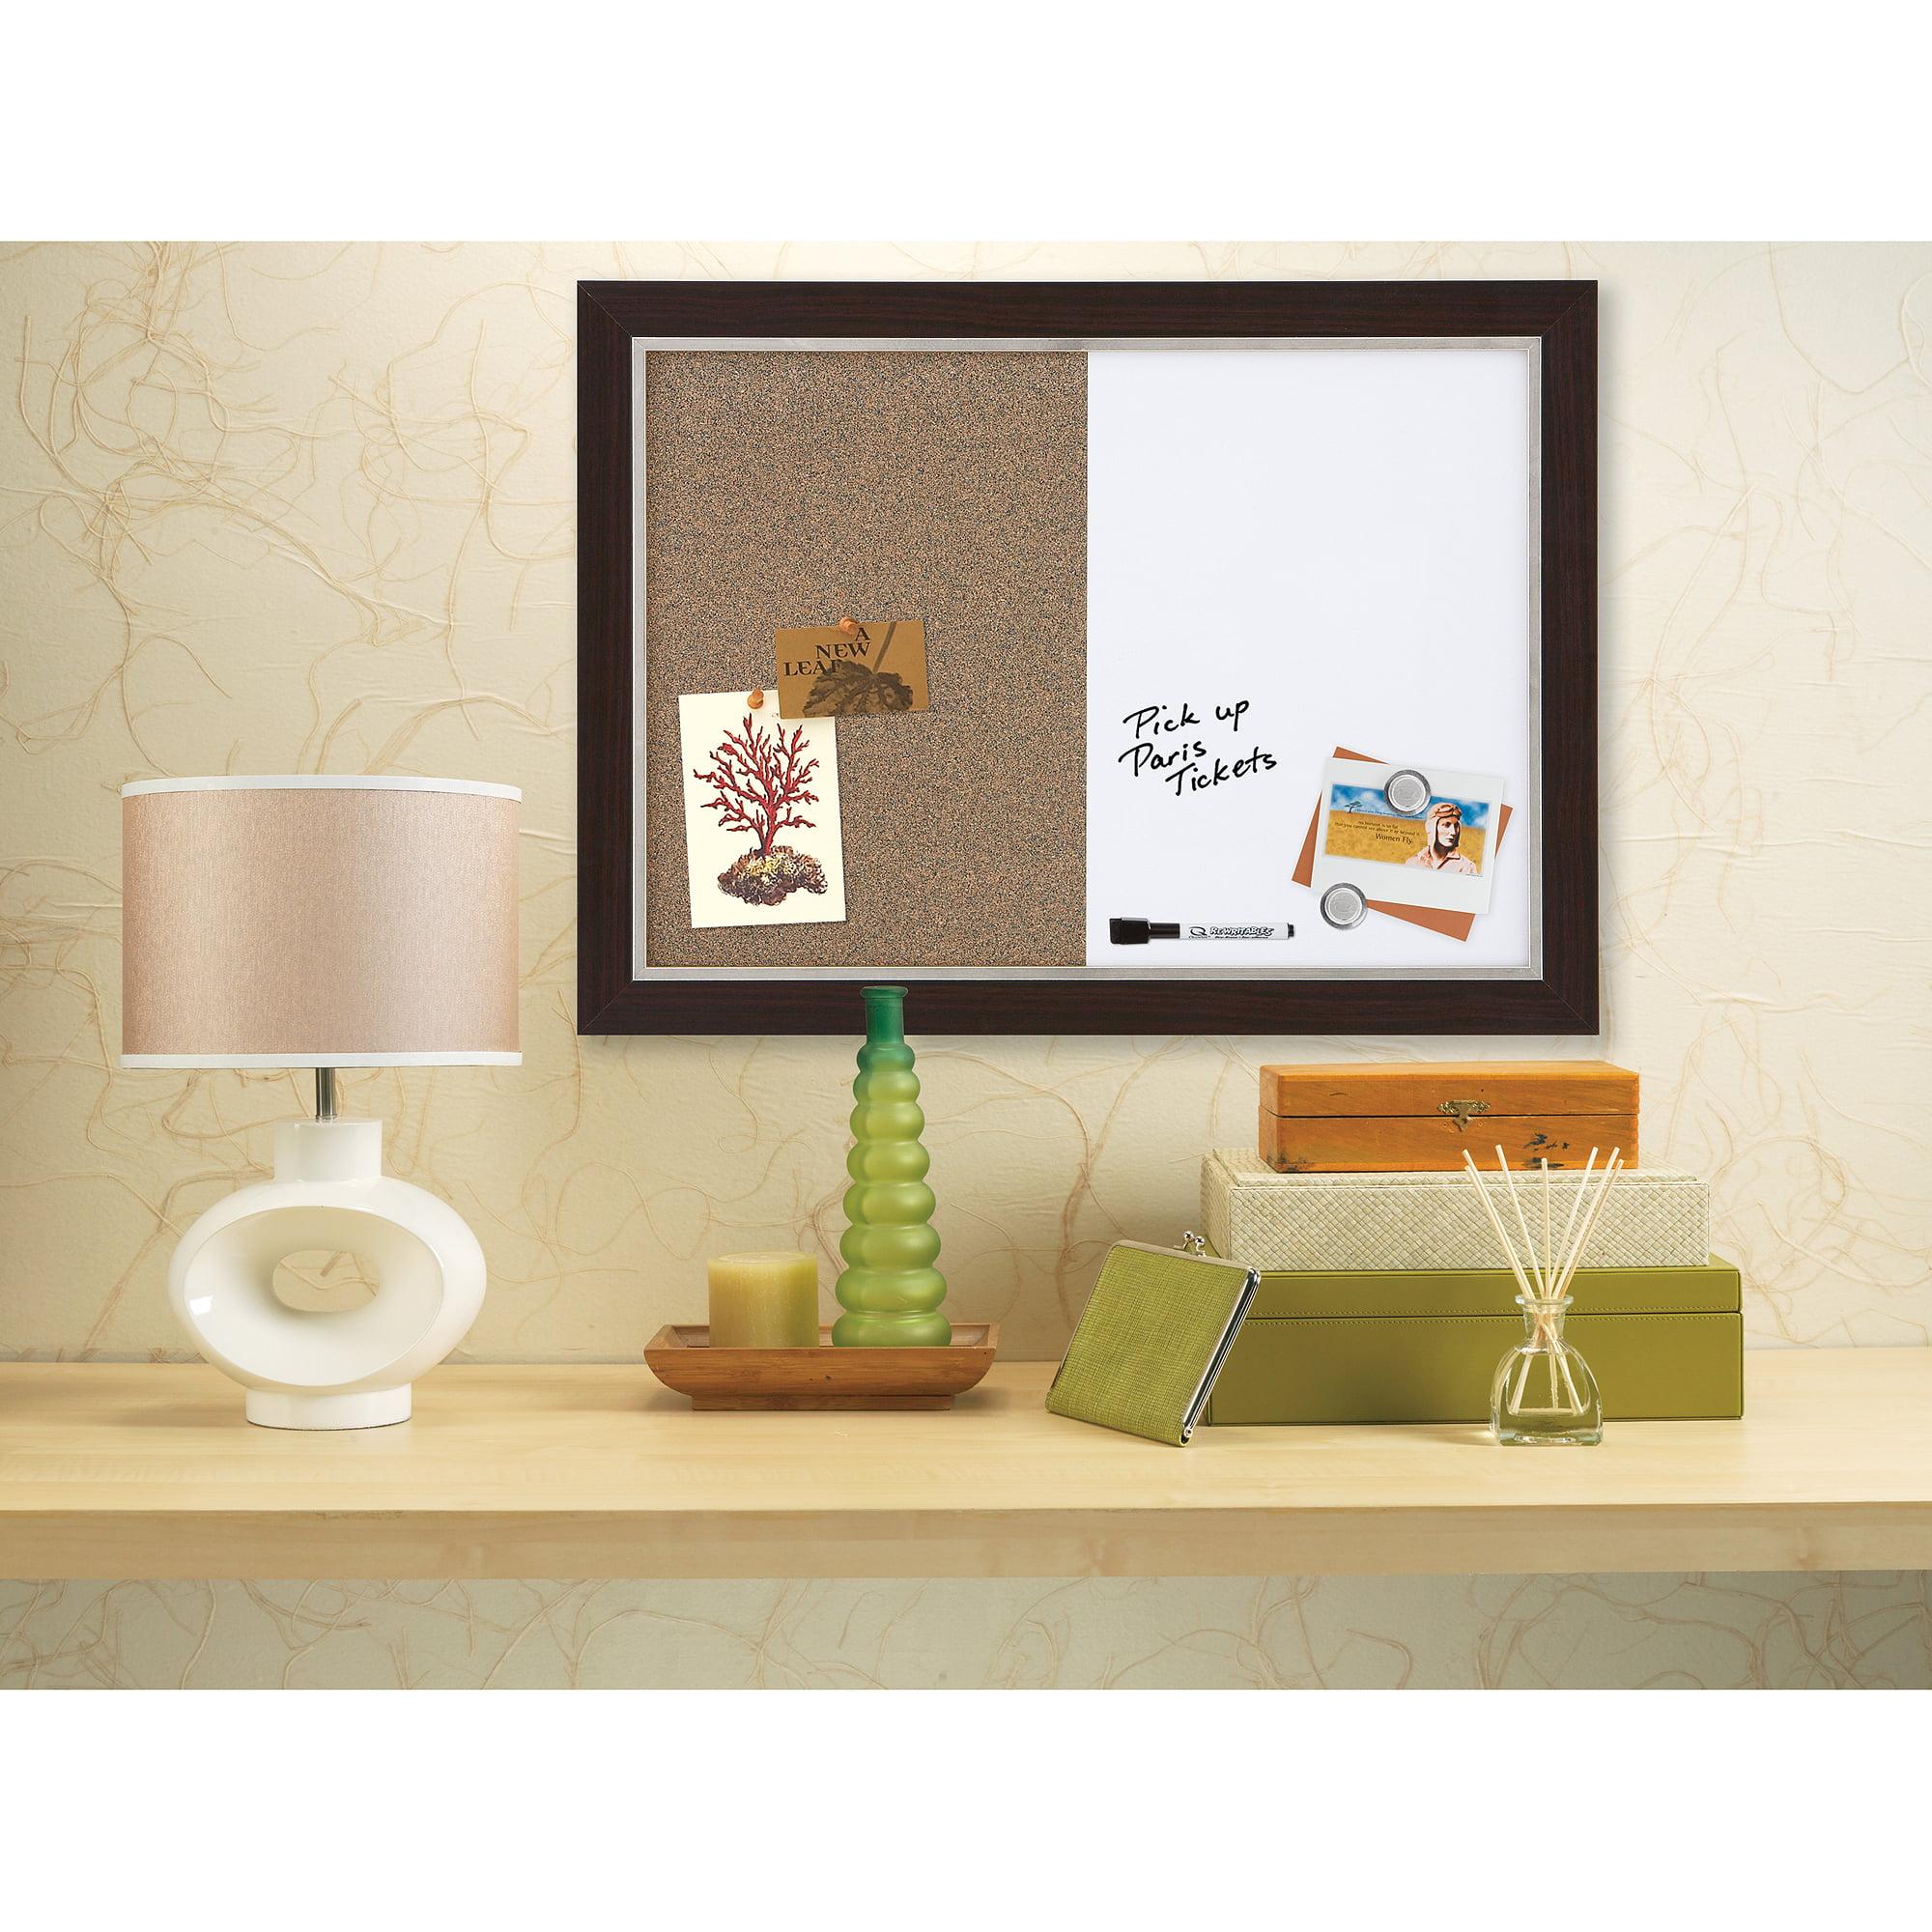 "Quartet Home Decor Combination Board, 17"" x 23"", Dry-Erase/Cork, 2-Tone Frame"